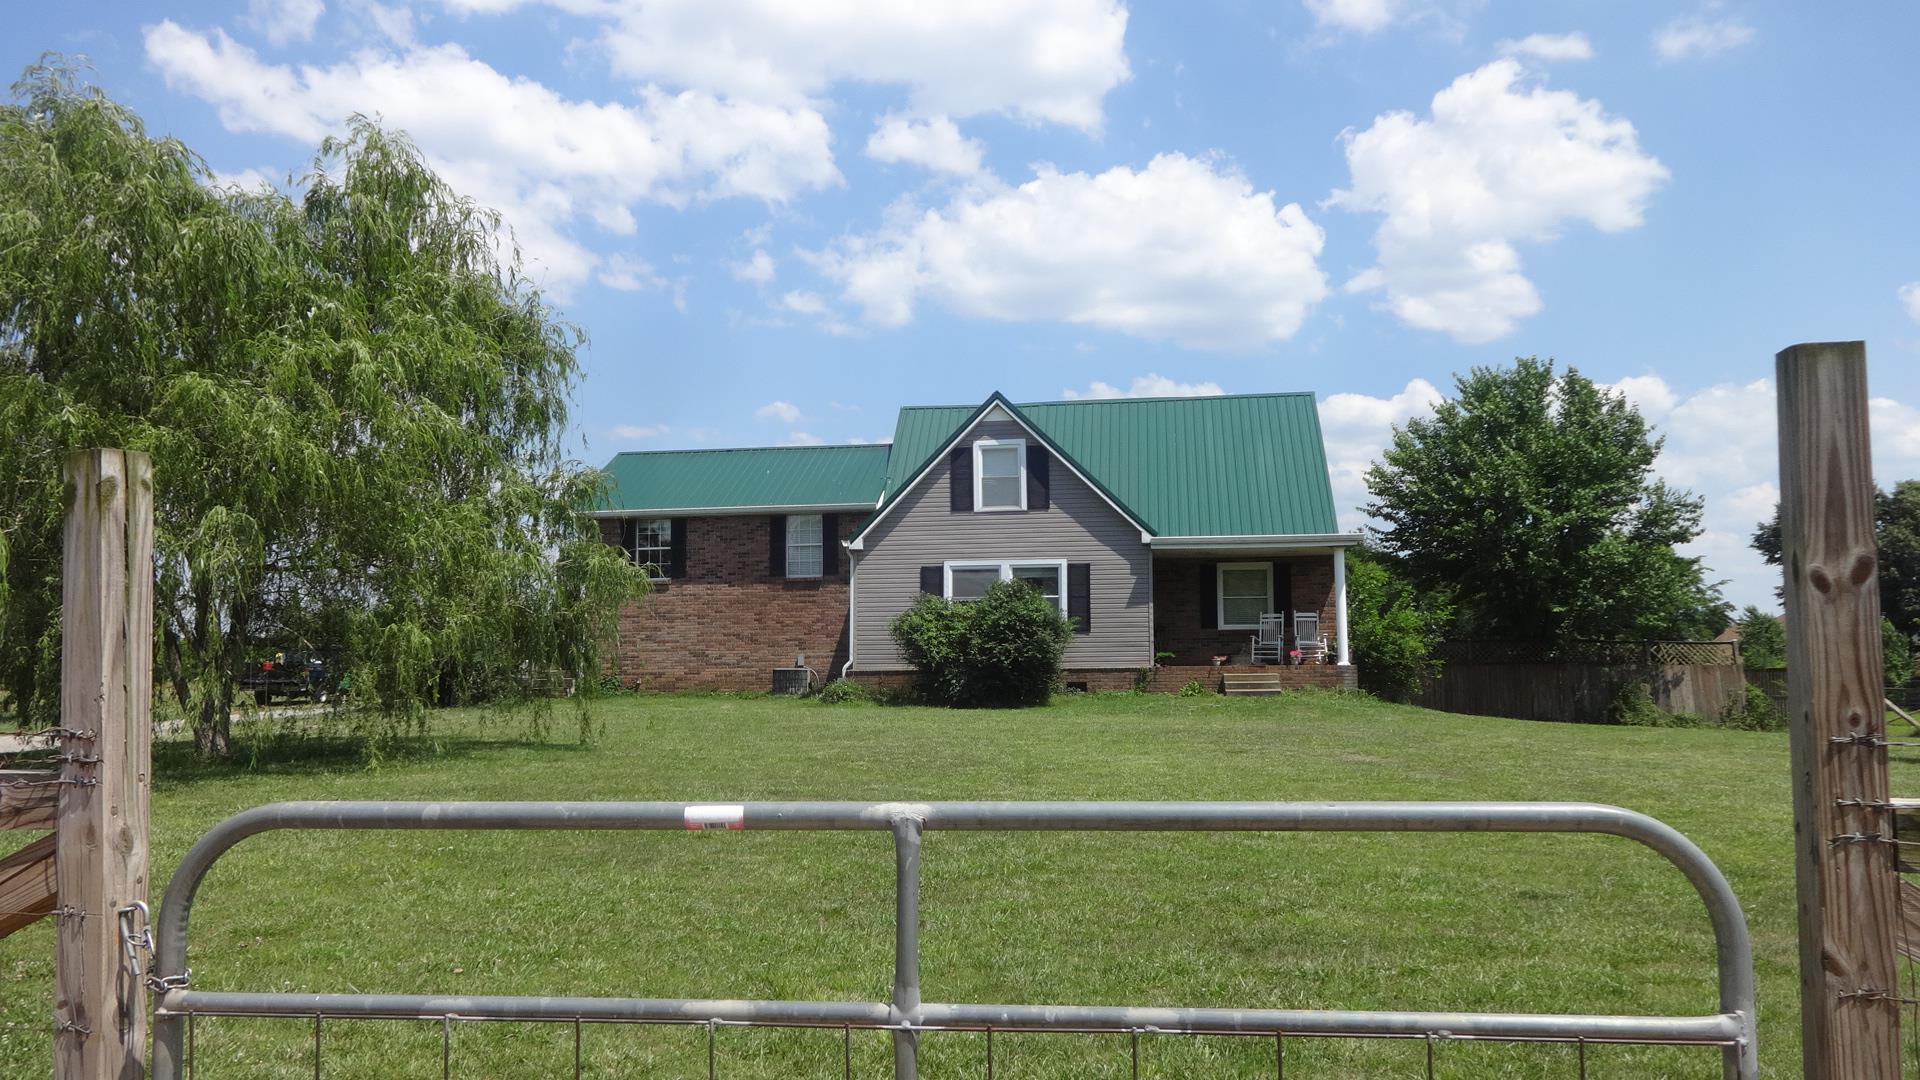 4545 Barfield Crescent Rd, Murfreesboro, TN 37128